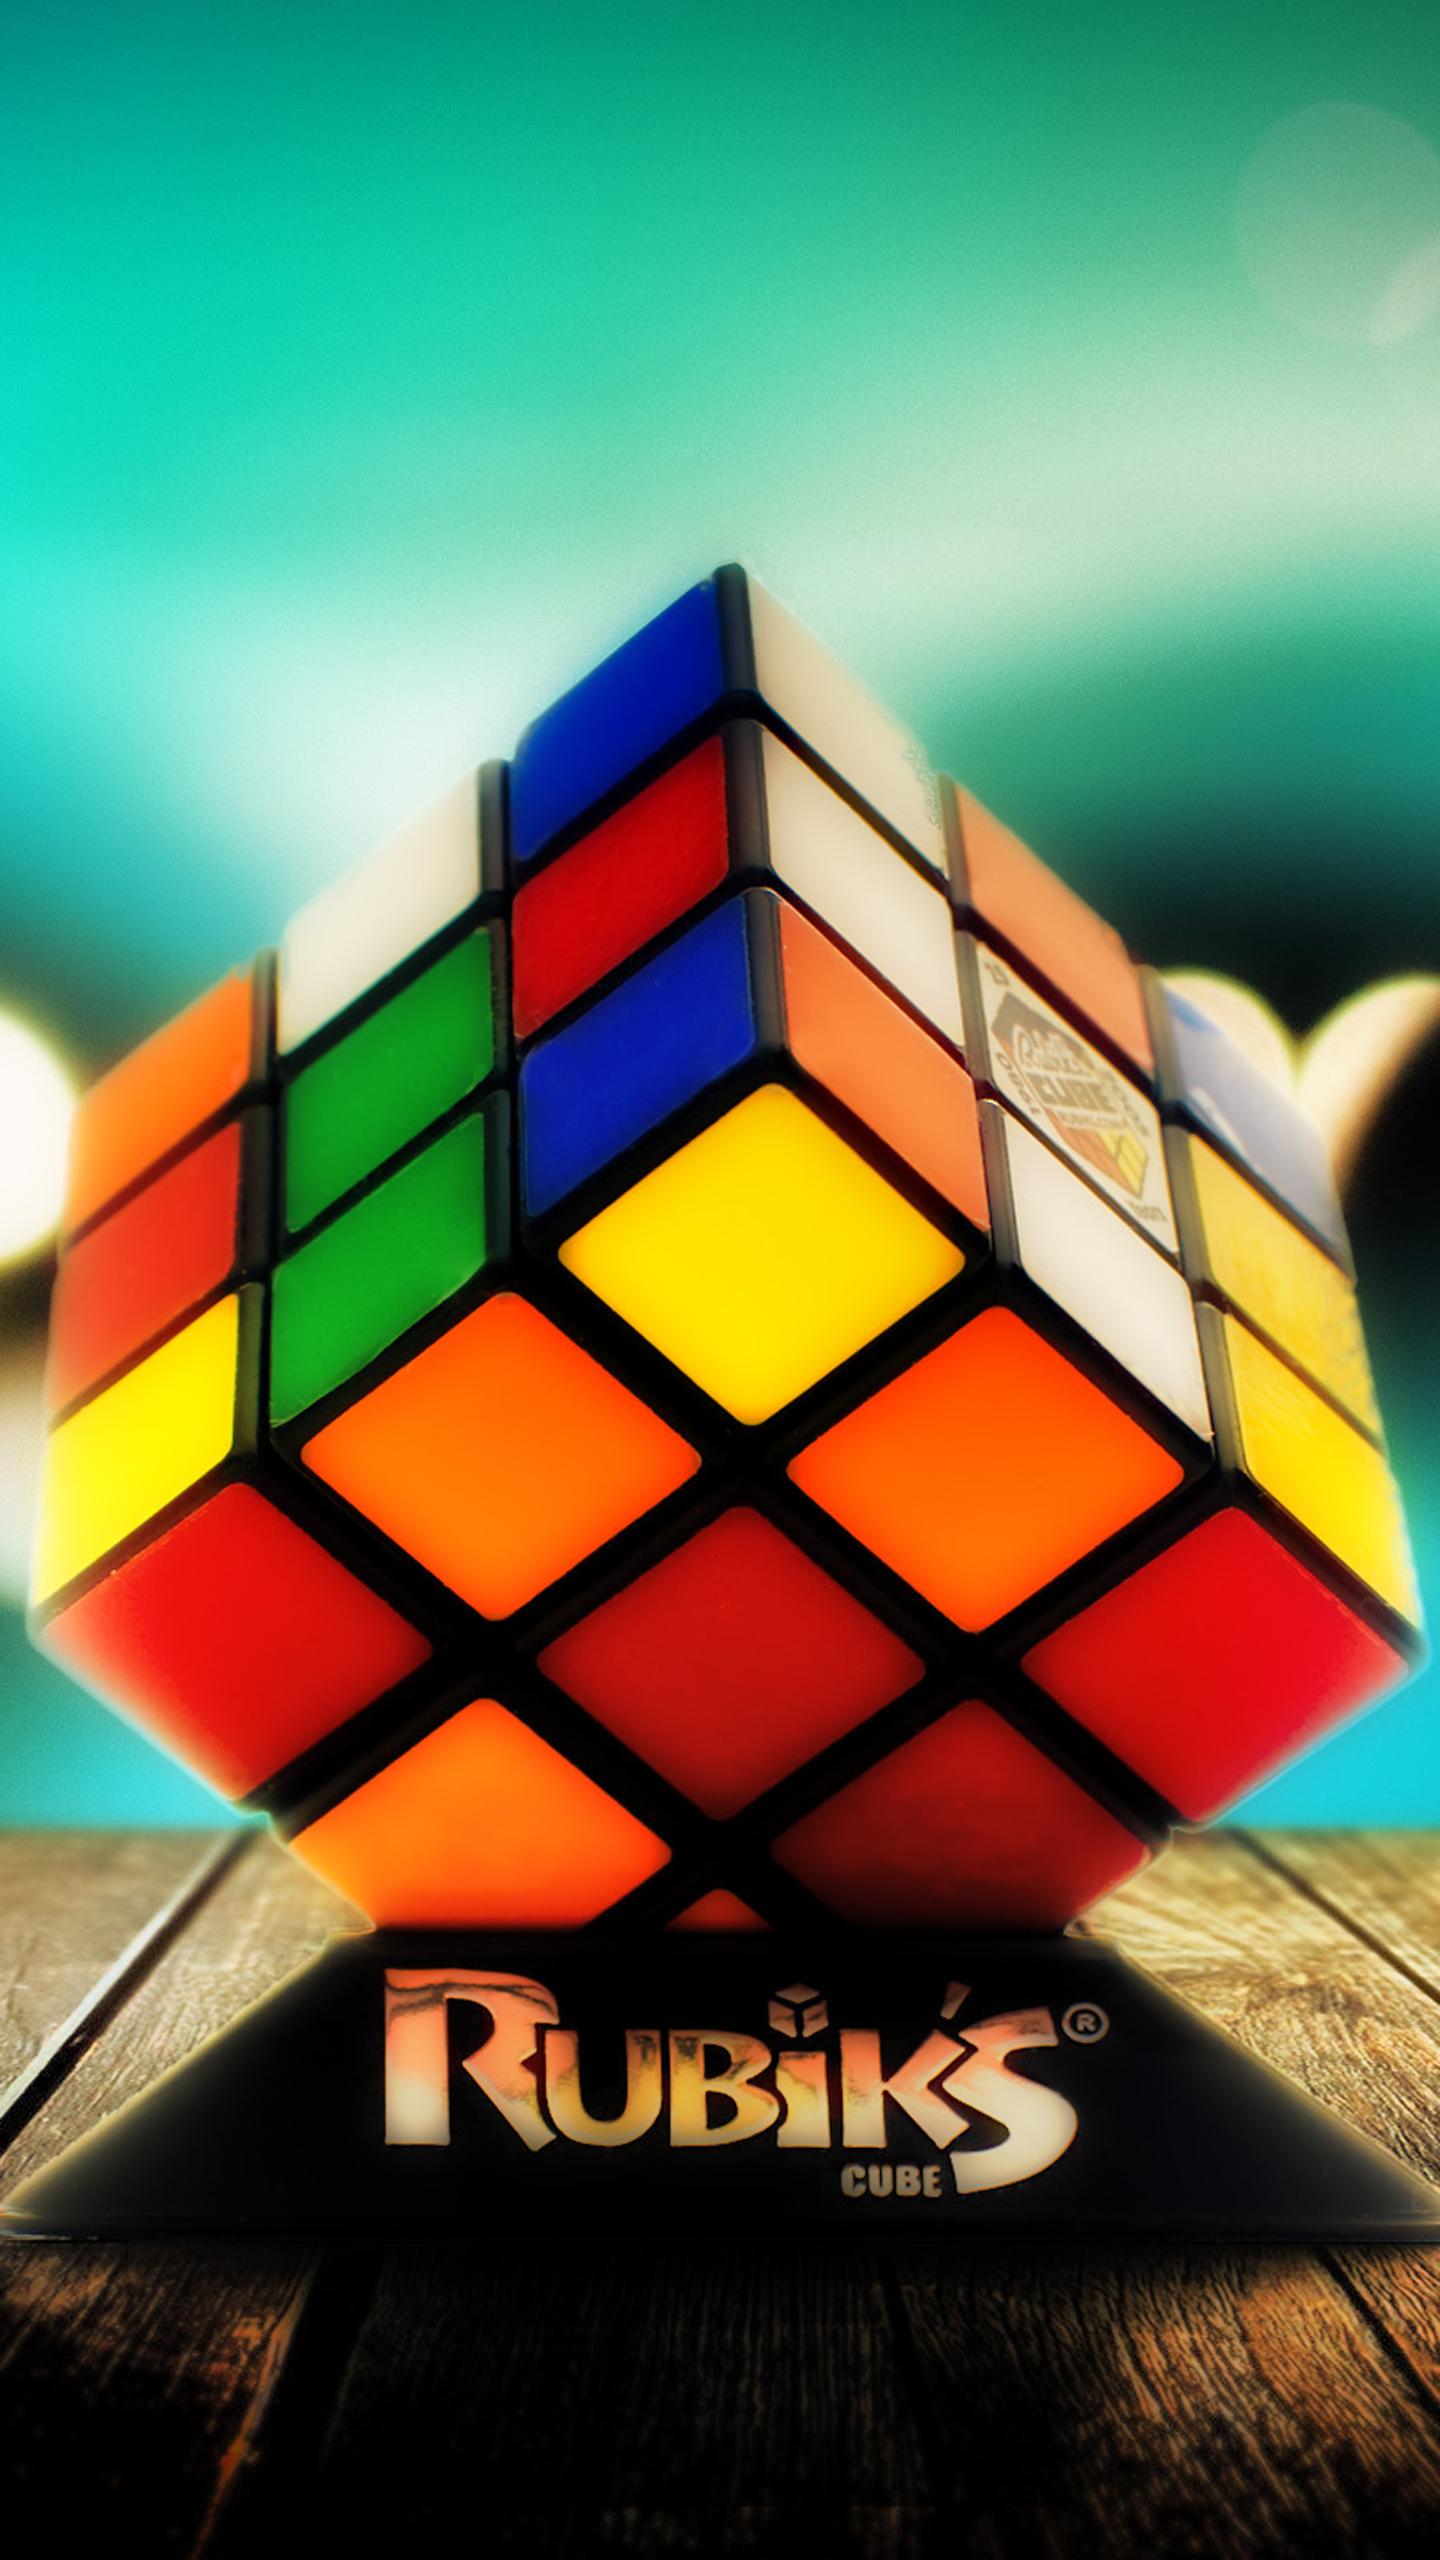 Rubiks Cube Figure Wallpaper D Wallpapers In 2019 Cube